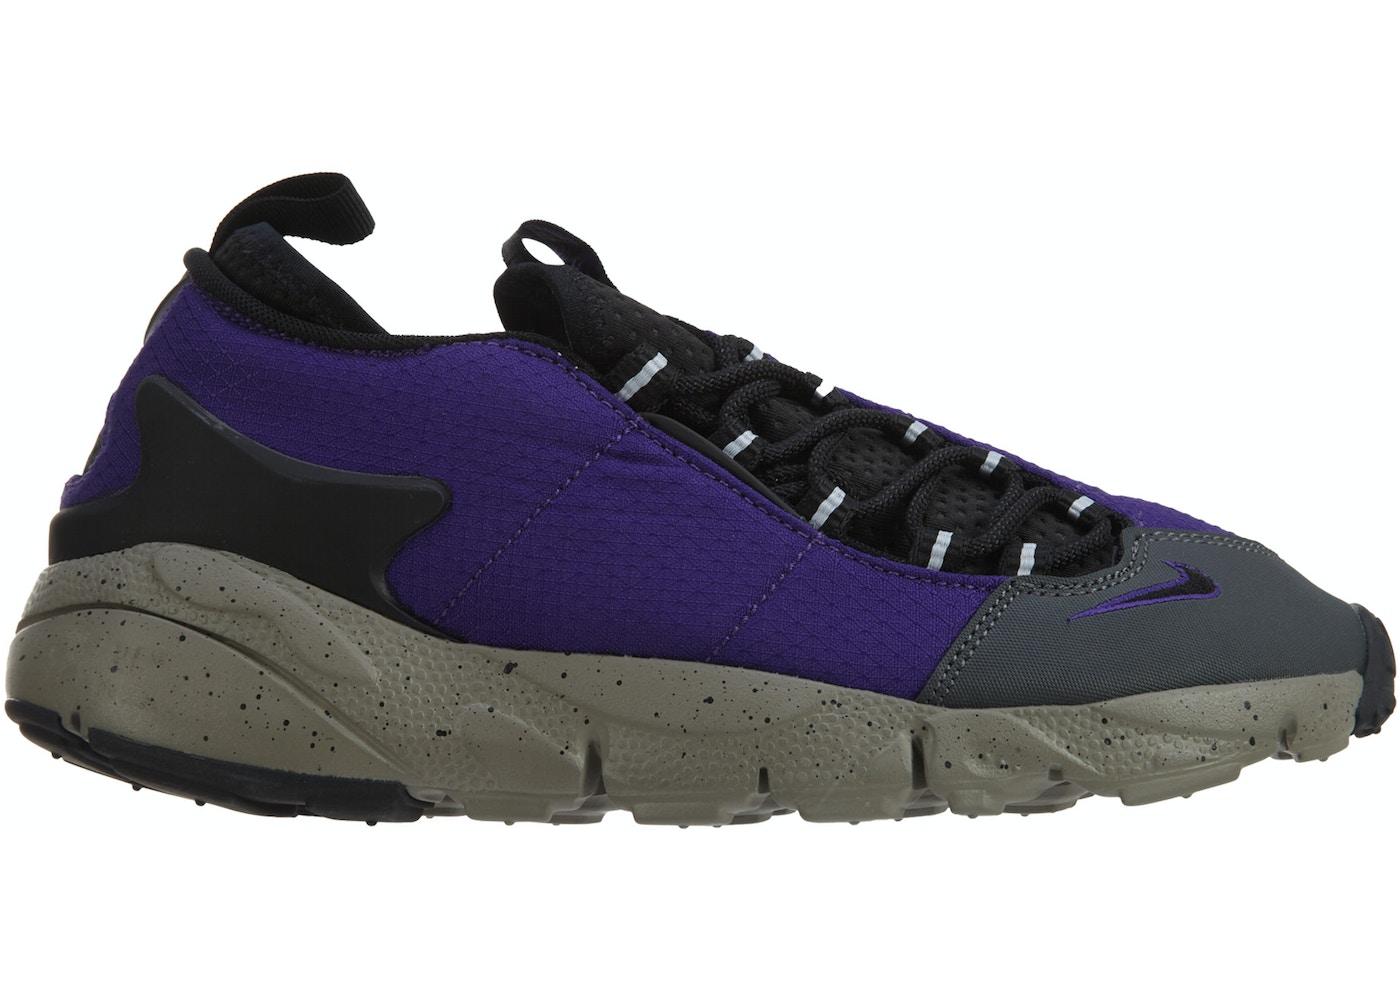 b09fd65e Nike Air Footscape Nm Court Purple/Black-Light Taupe - 852629-500